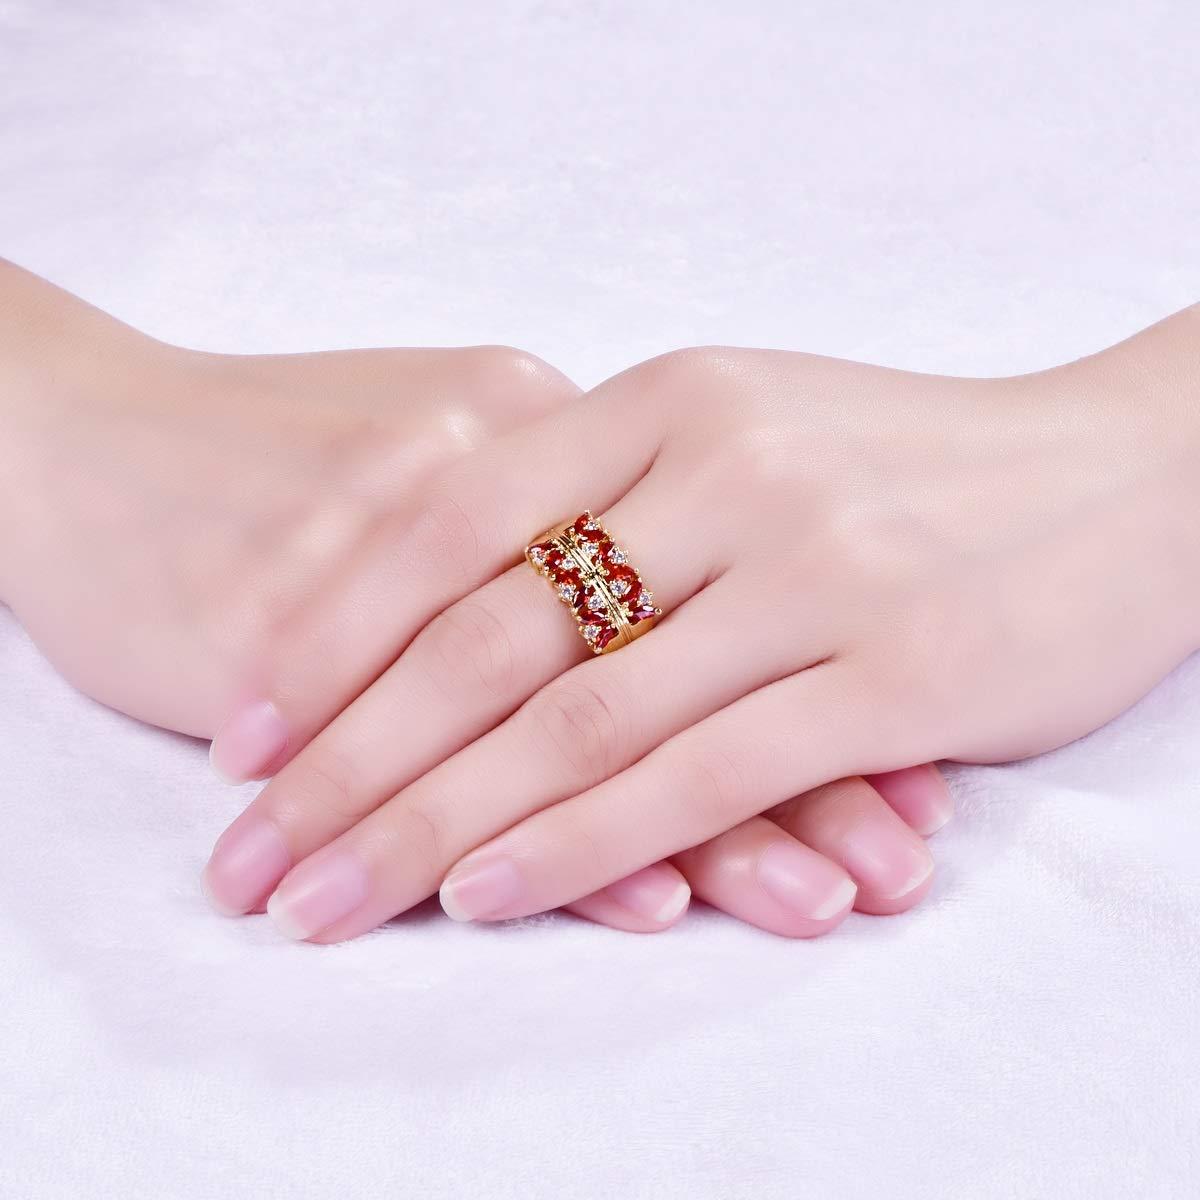 Amazon.com : Muiane Yellow Gold Plated Created Garnet Wide Wedding ...